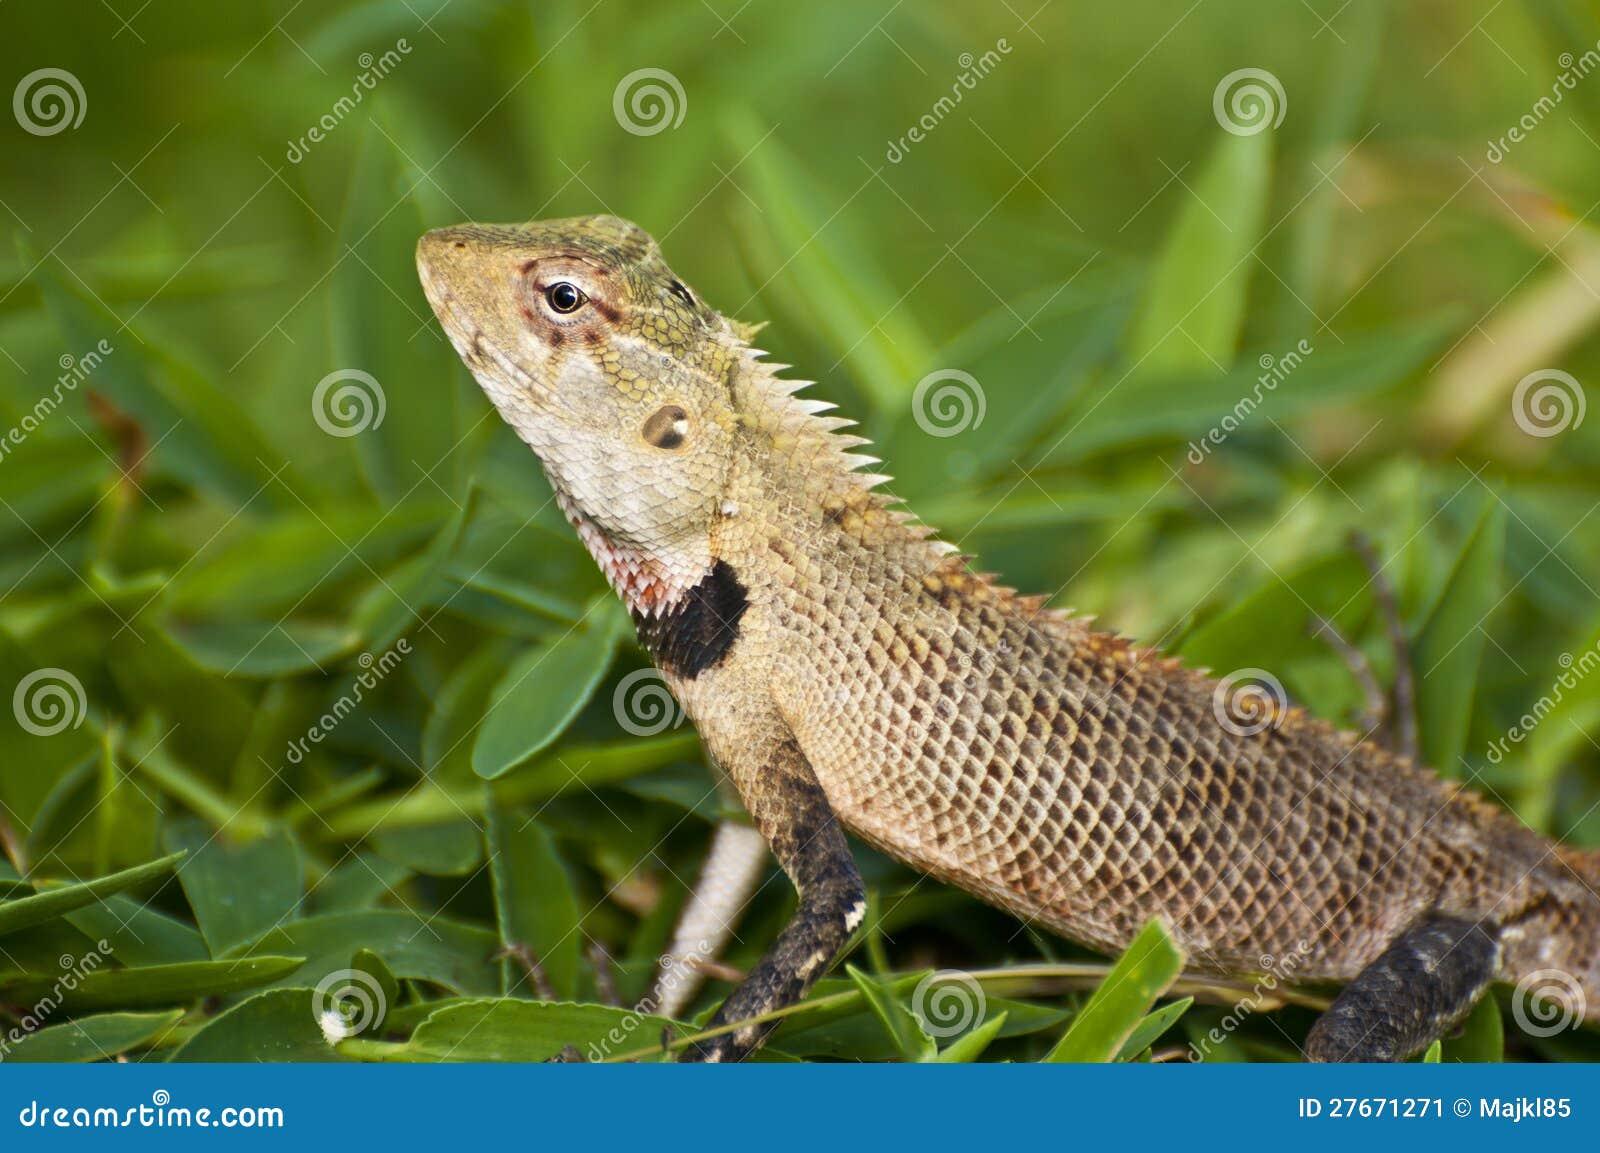 download oriental garden lizard female stock image image of wild grass 27671271 - Garden Lizard